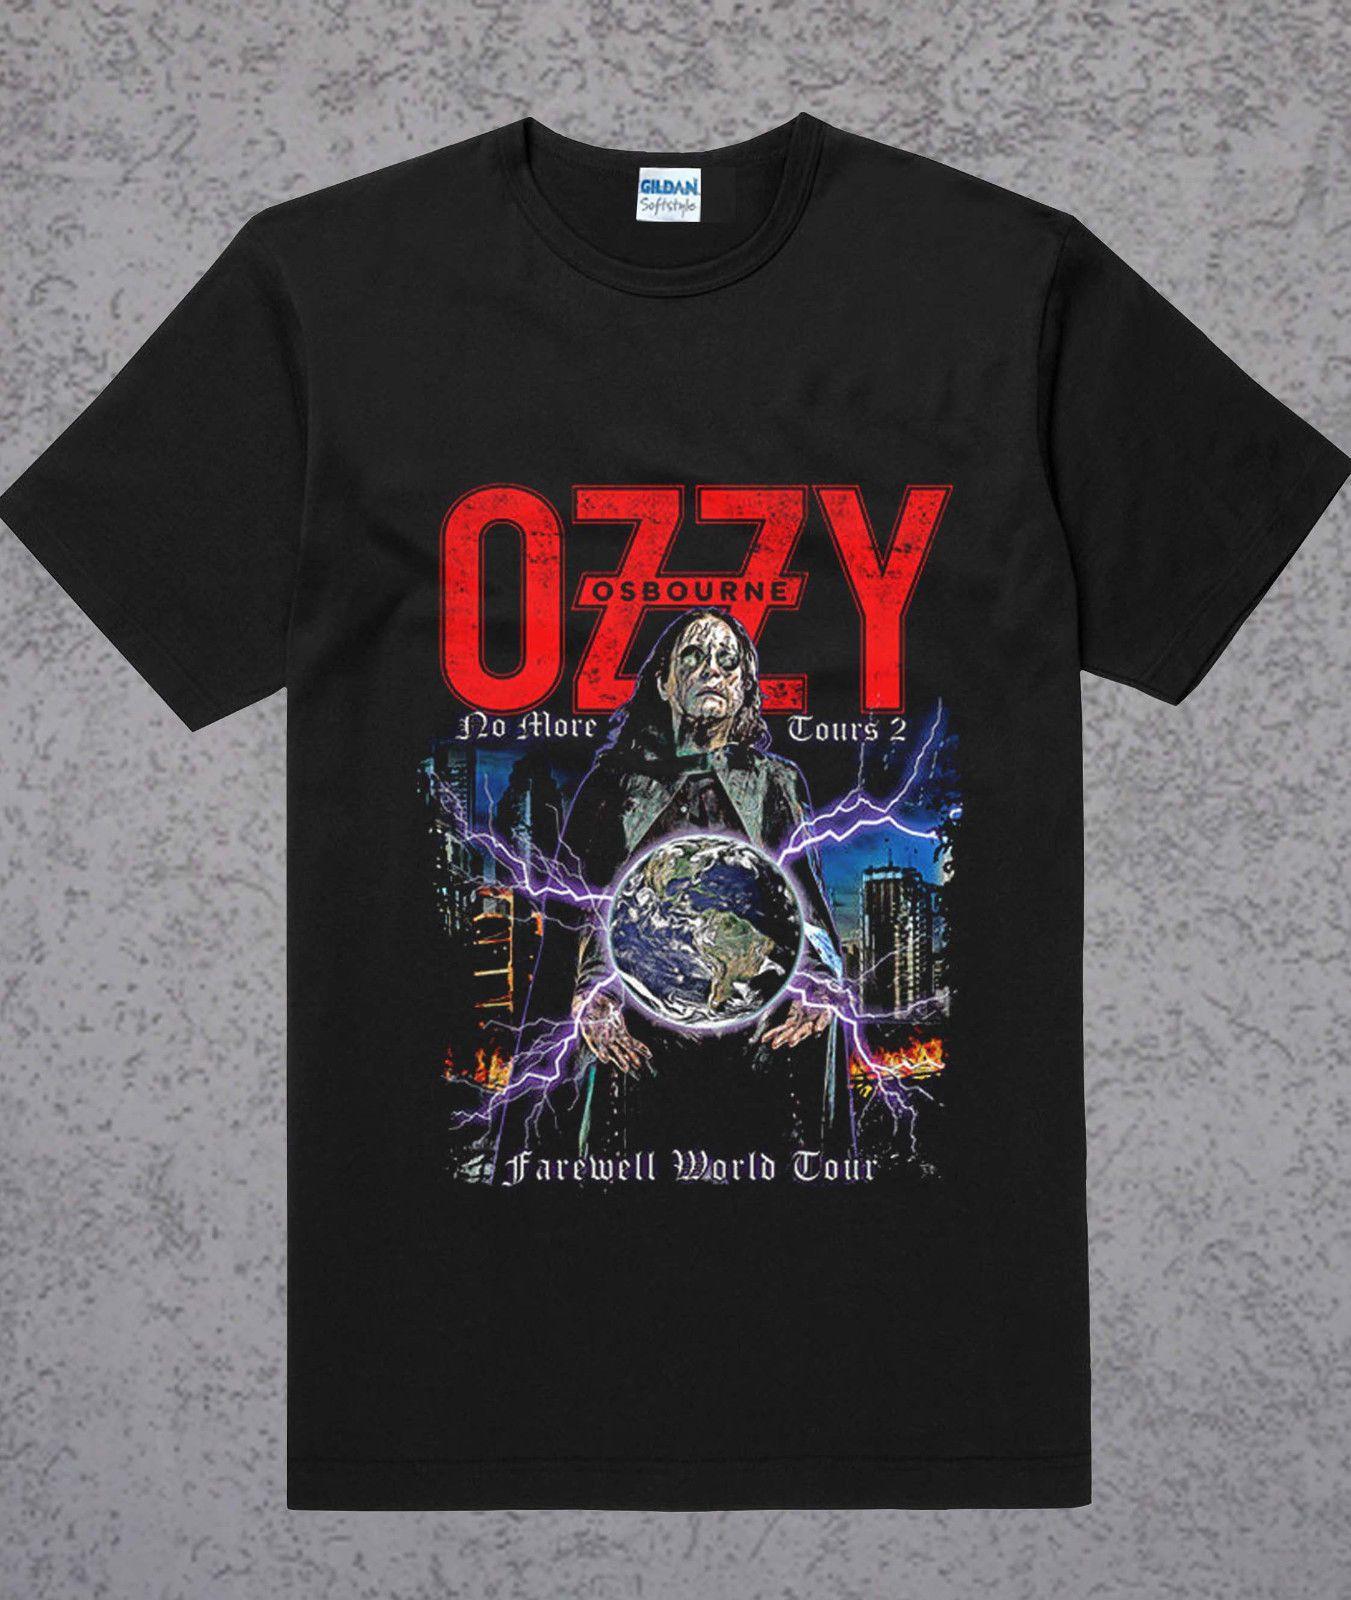 f84cdd4c607 Ozzy Osbourne T Shirt Black Sabbath 2018 No More Tour T Shirt Size S To 3XL  Printing Tee Shirts Cool Funny T Shirts From Tshirtsdesign49